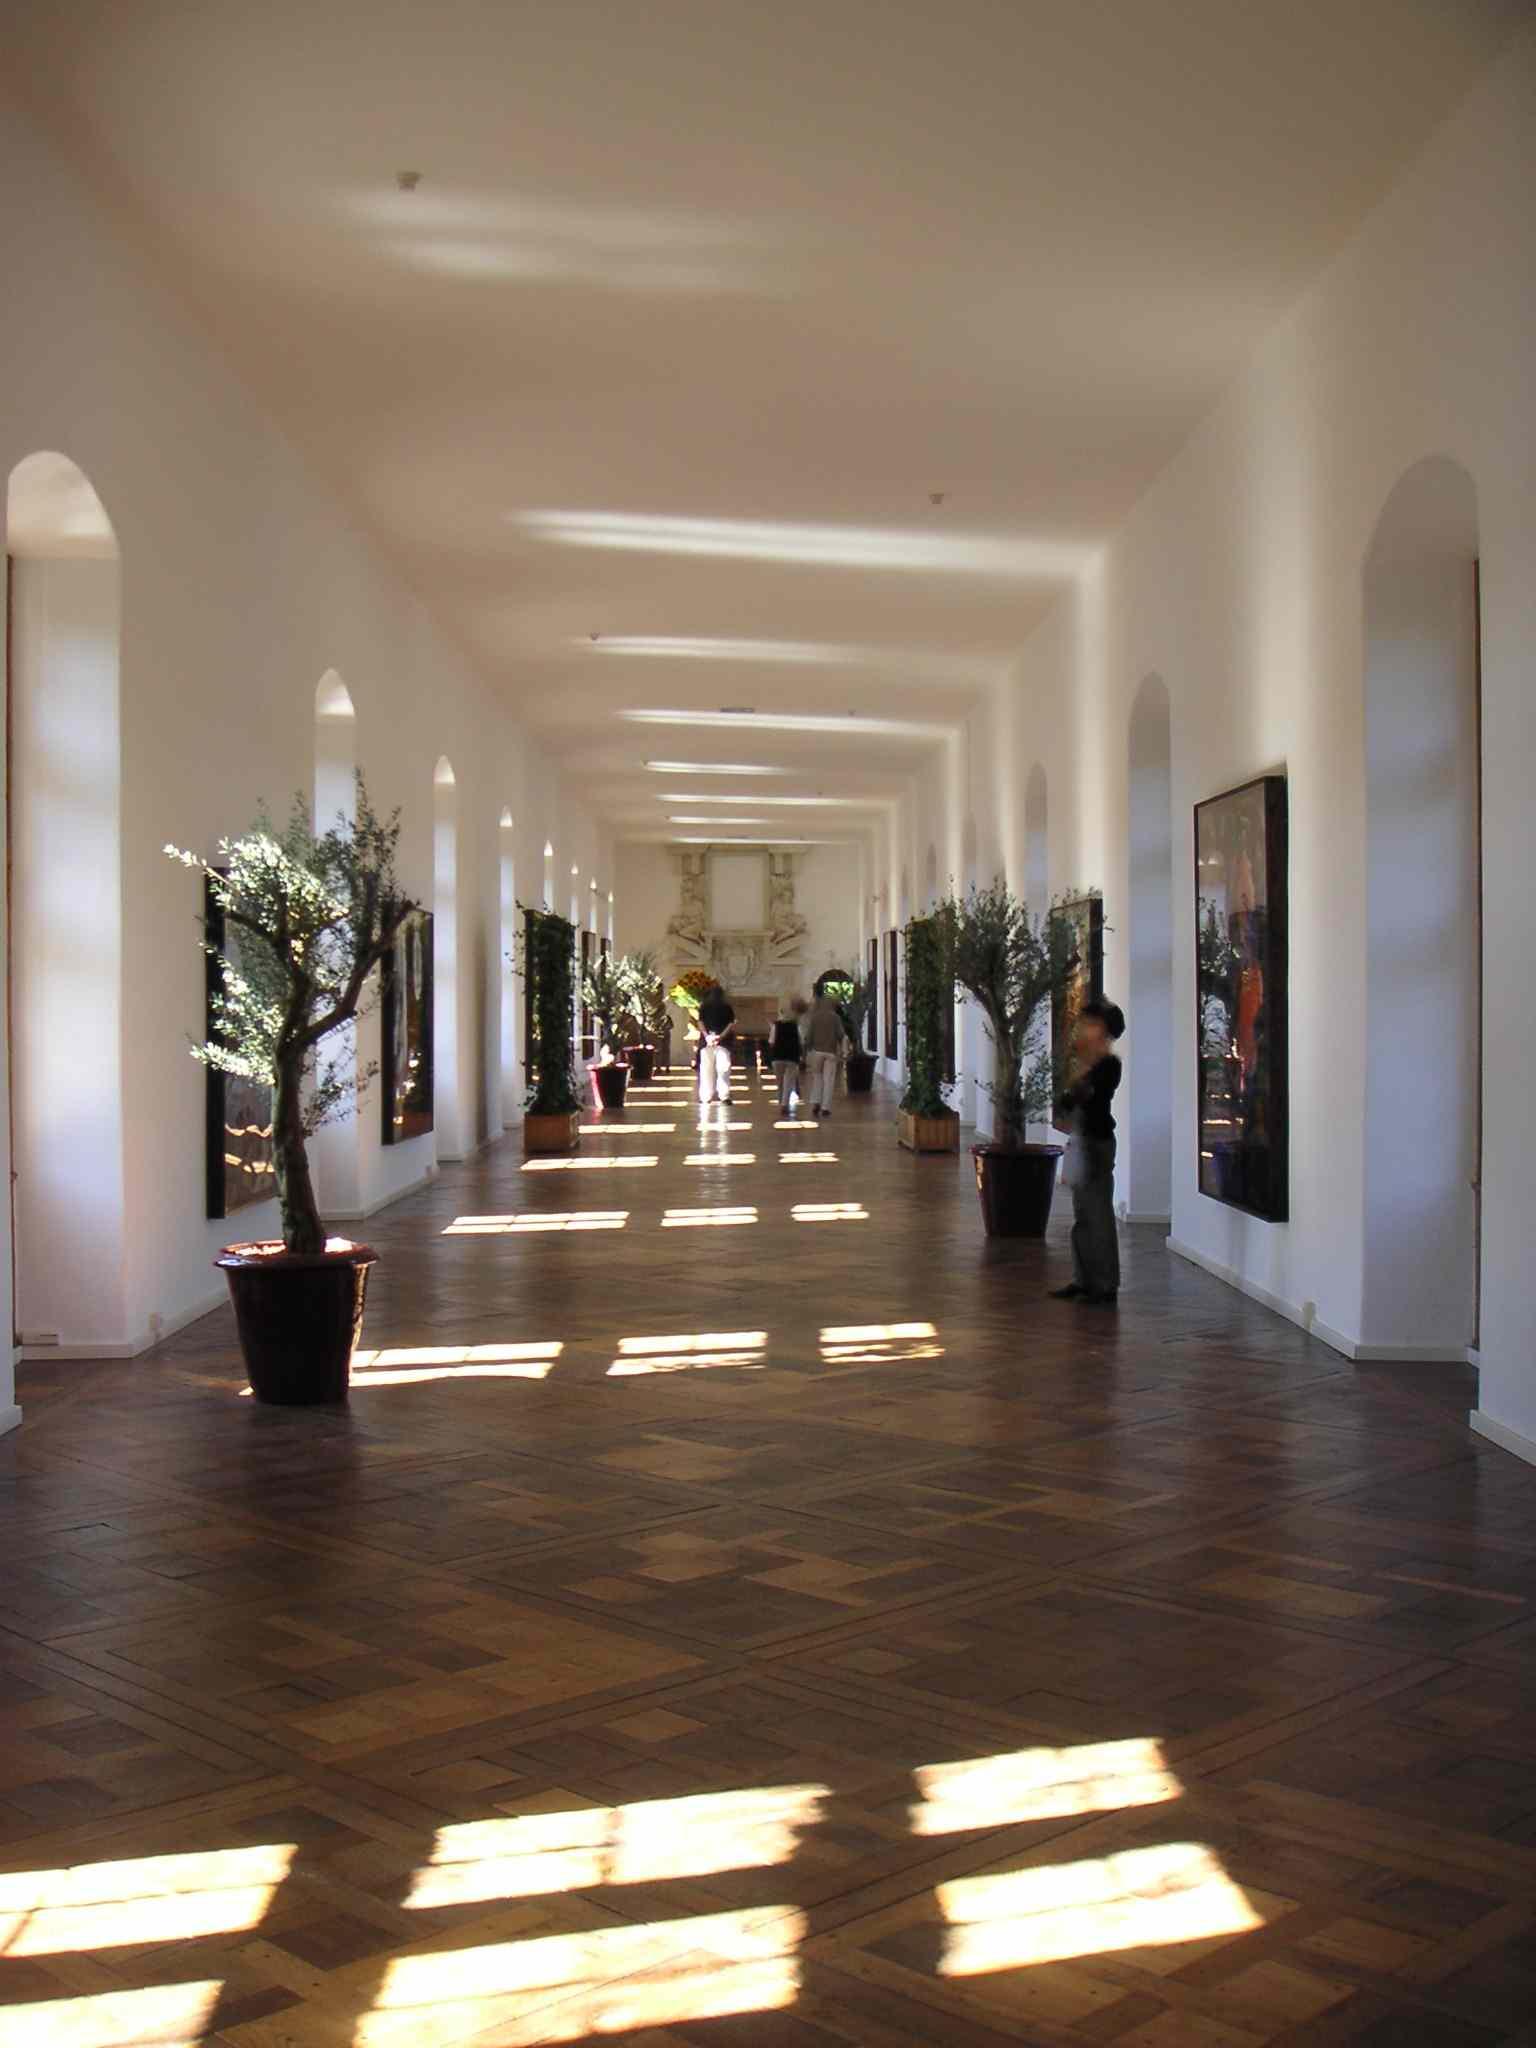 File:Château-de-chenonceau galerie 1er.JPG - Wikimedia Commons